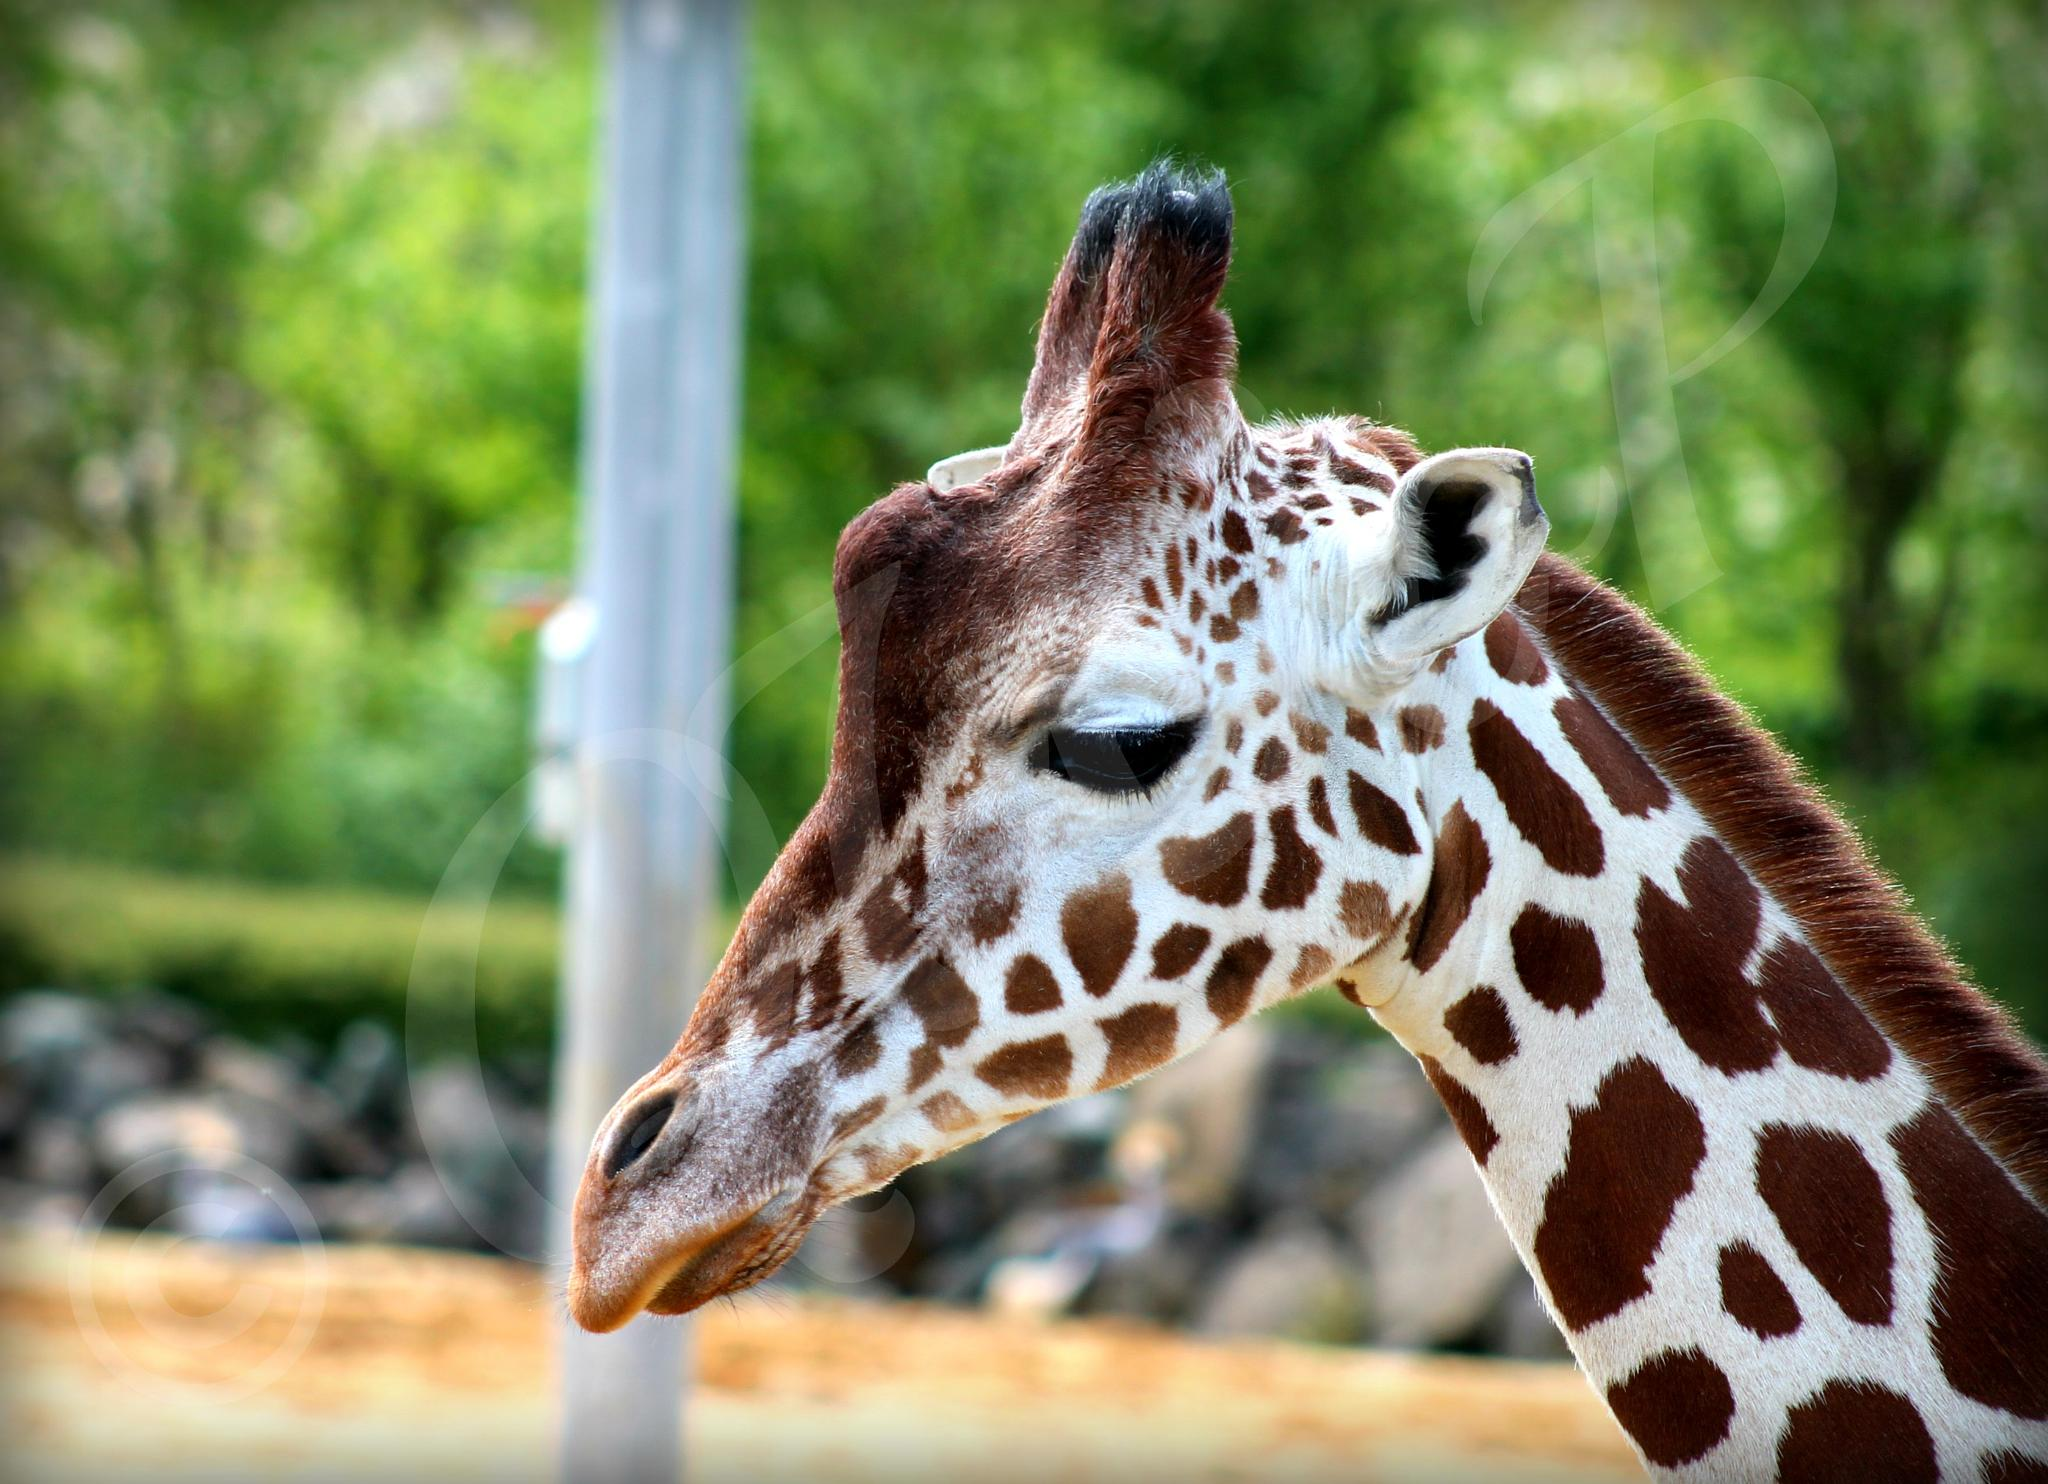 Giraffe by Casey-Jaie Thomas